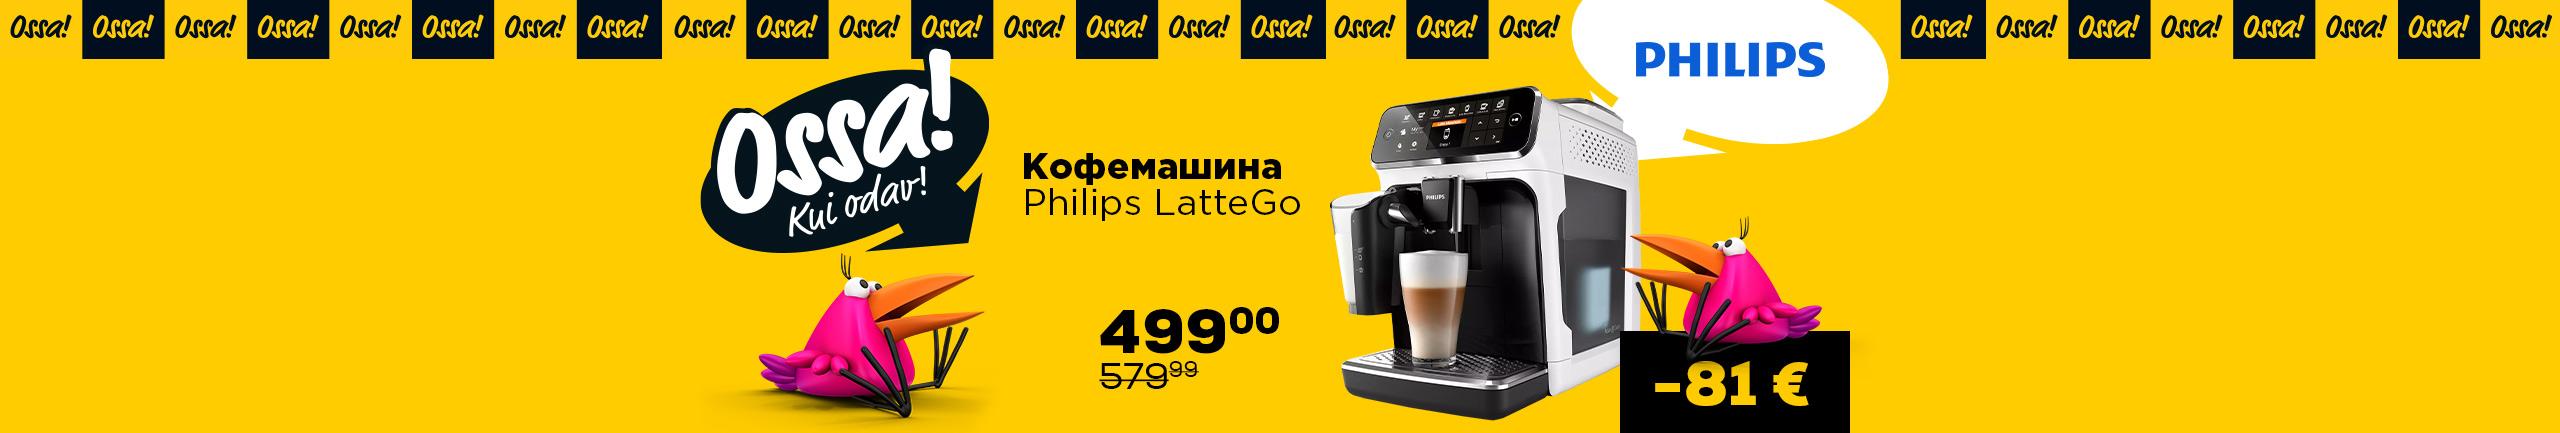 NPL  Ухх! Kaк низкие цены. Лето 2021 Philips LatteGo